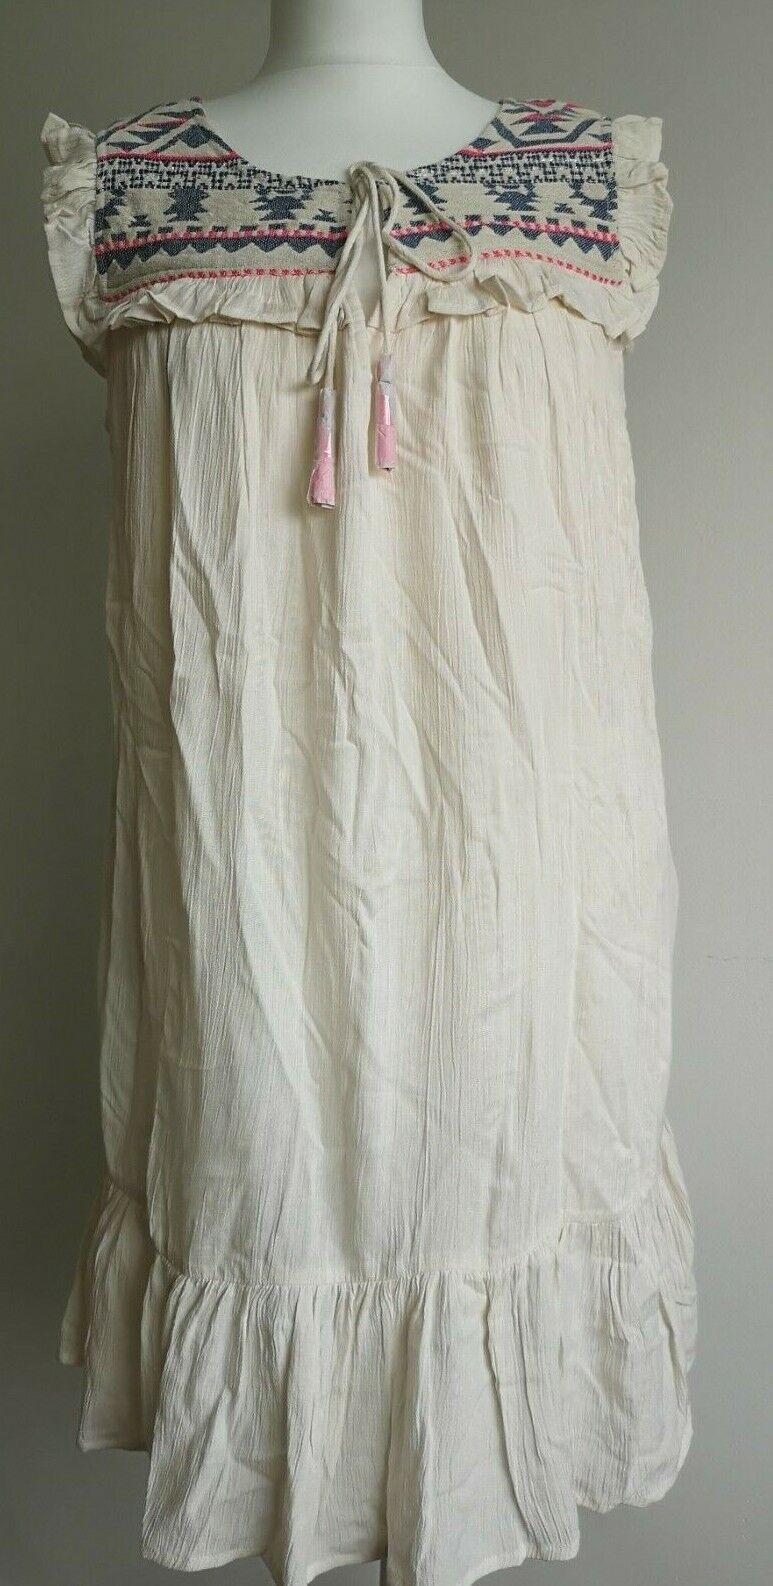 Monsoon Accessorize Beautiful Womens Beach Summer Lined Cream Dress Size M BNWT